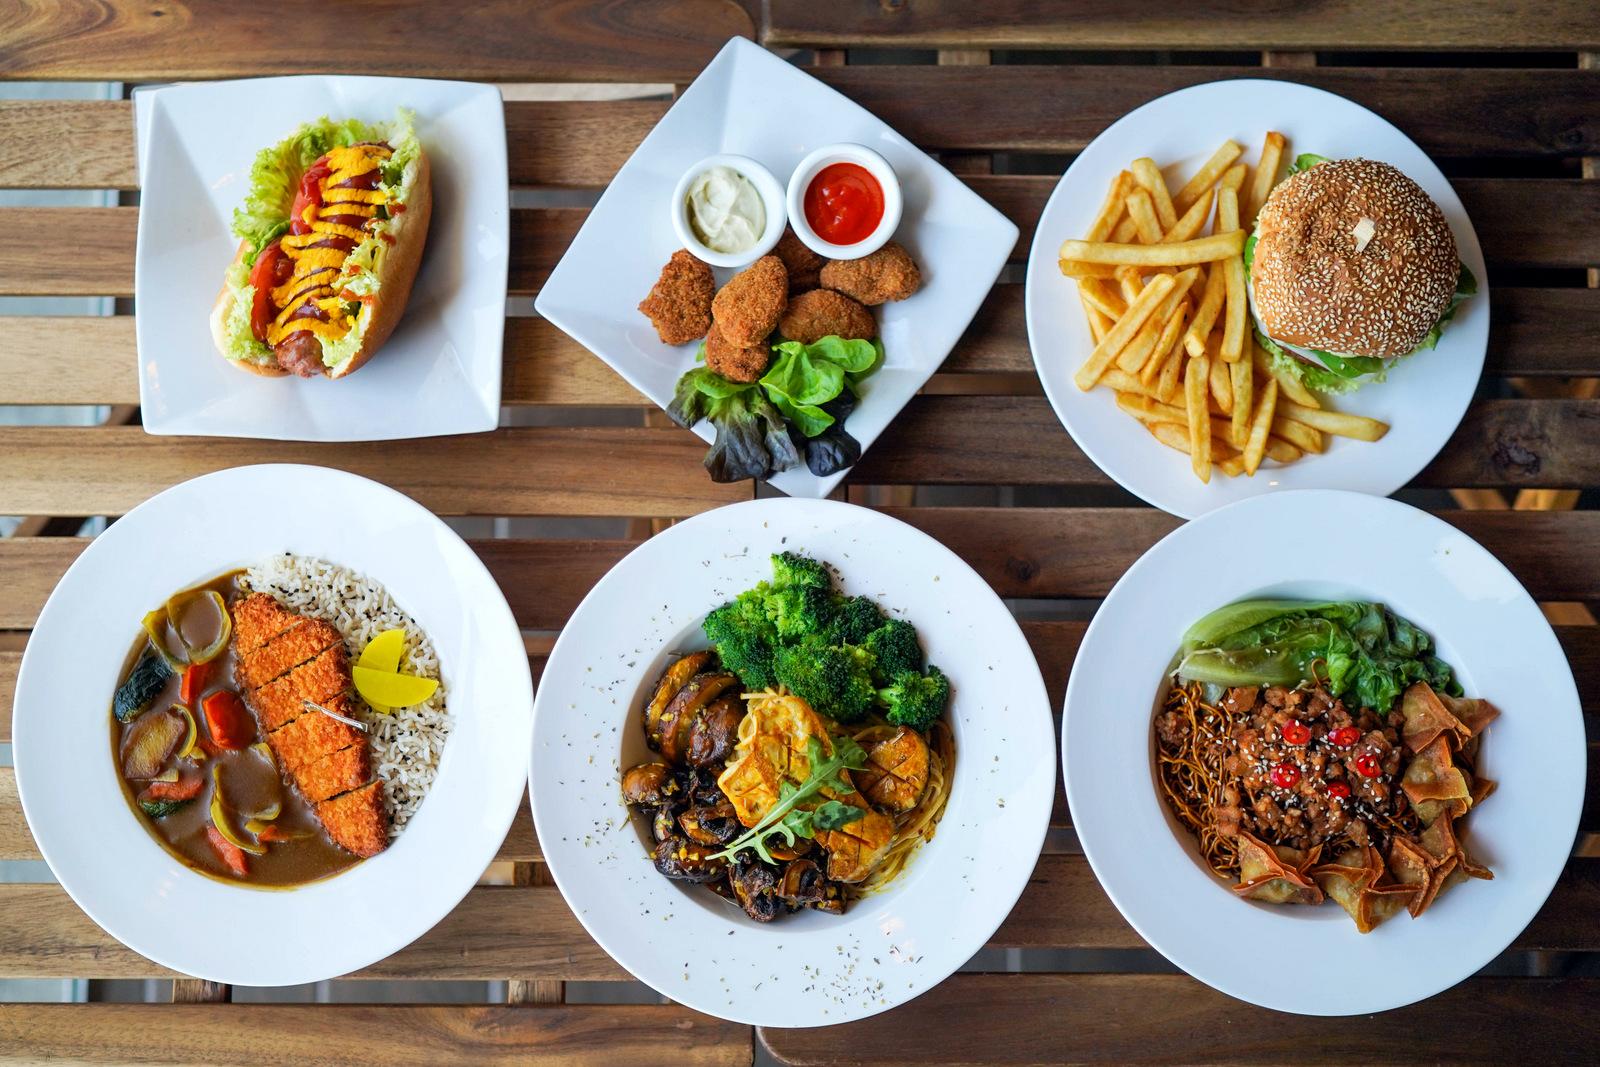 PC Studio Cafe: A progressive take on plant-powered burgers, pastas & snacks in Petaling Jaya